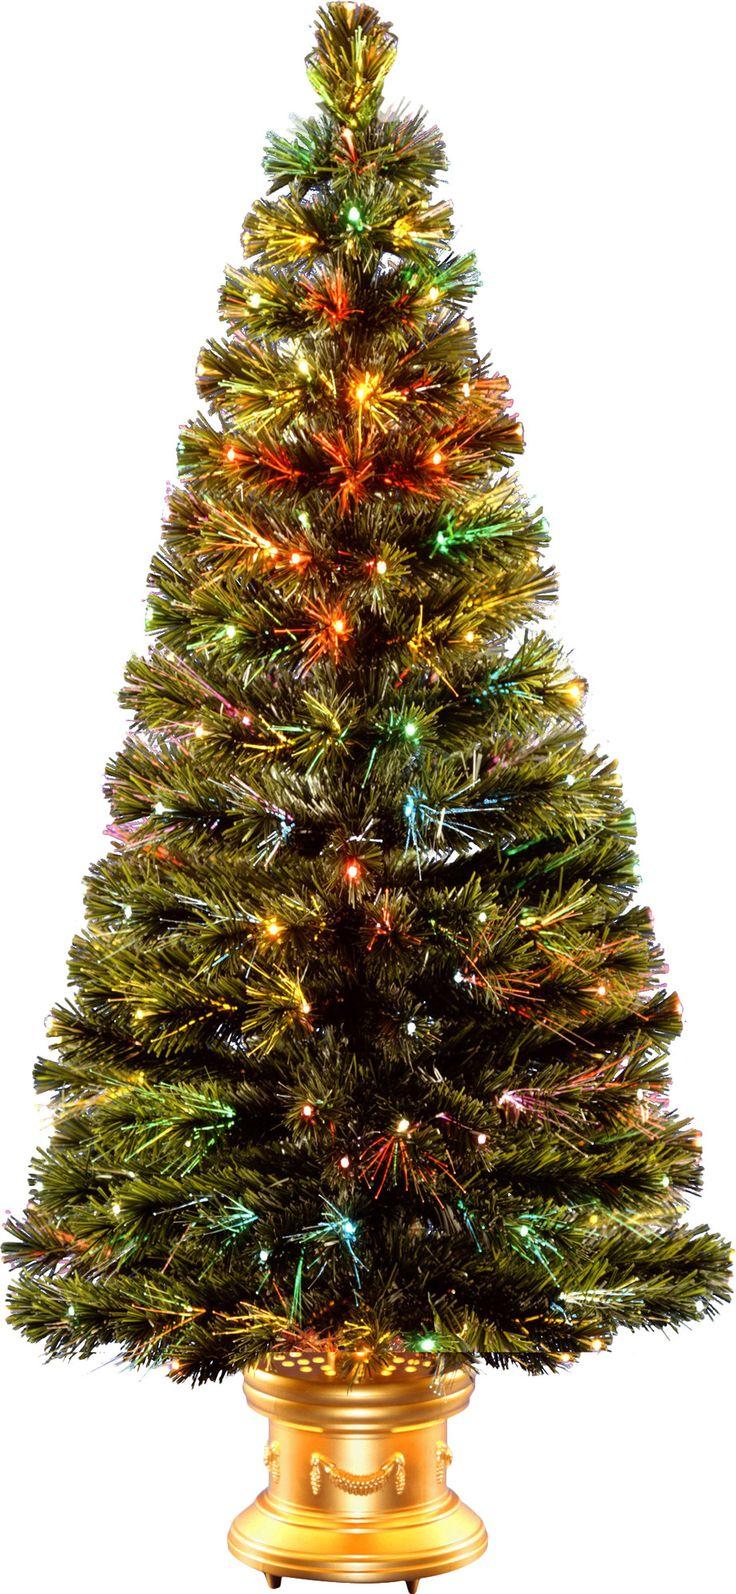 Crestwood small artificial christmas tree with plastic bronze pot - Fiber Optics Radiance Fireworks 5 Green Artificial Christmas Tree